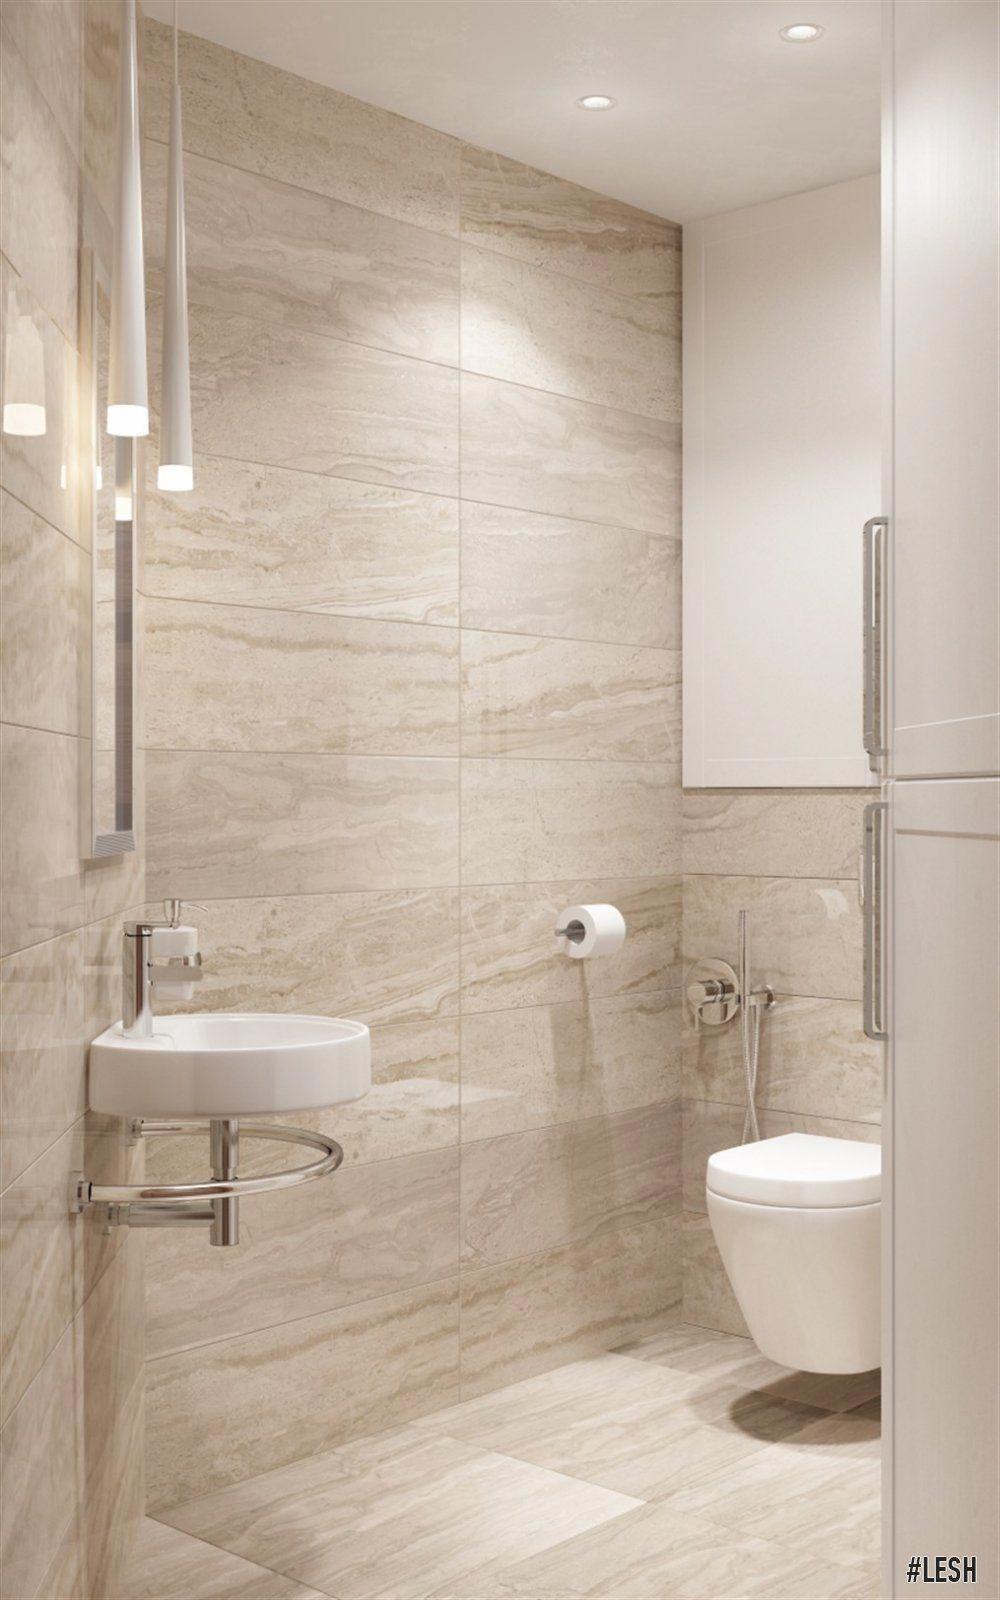 Modern bathroom  LESH (design interior, bathroom small, modern